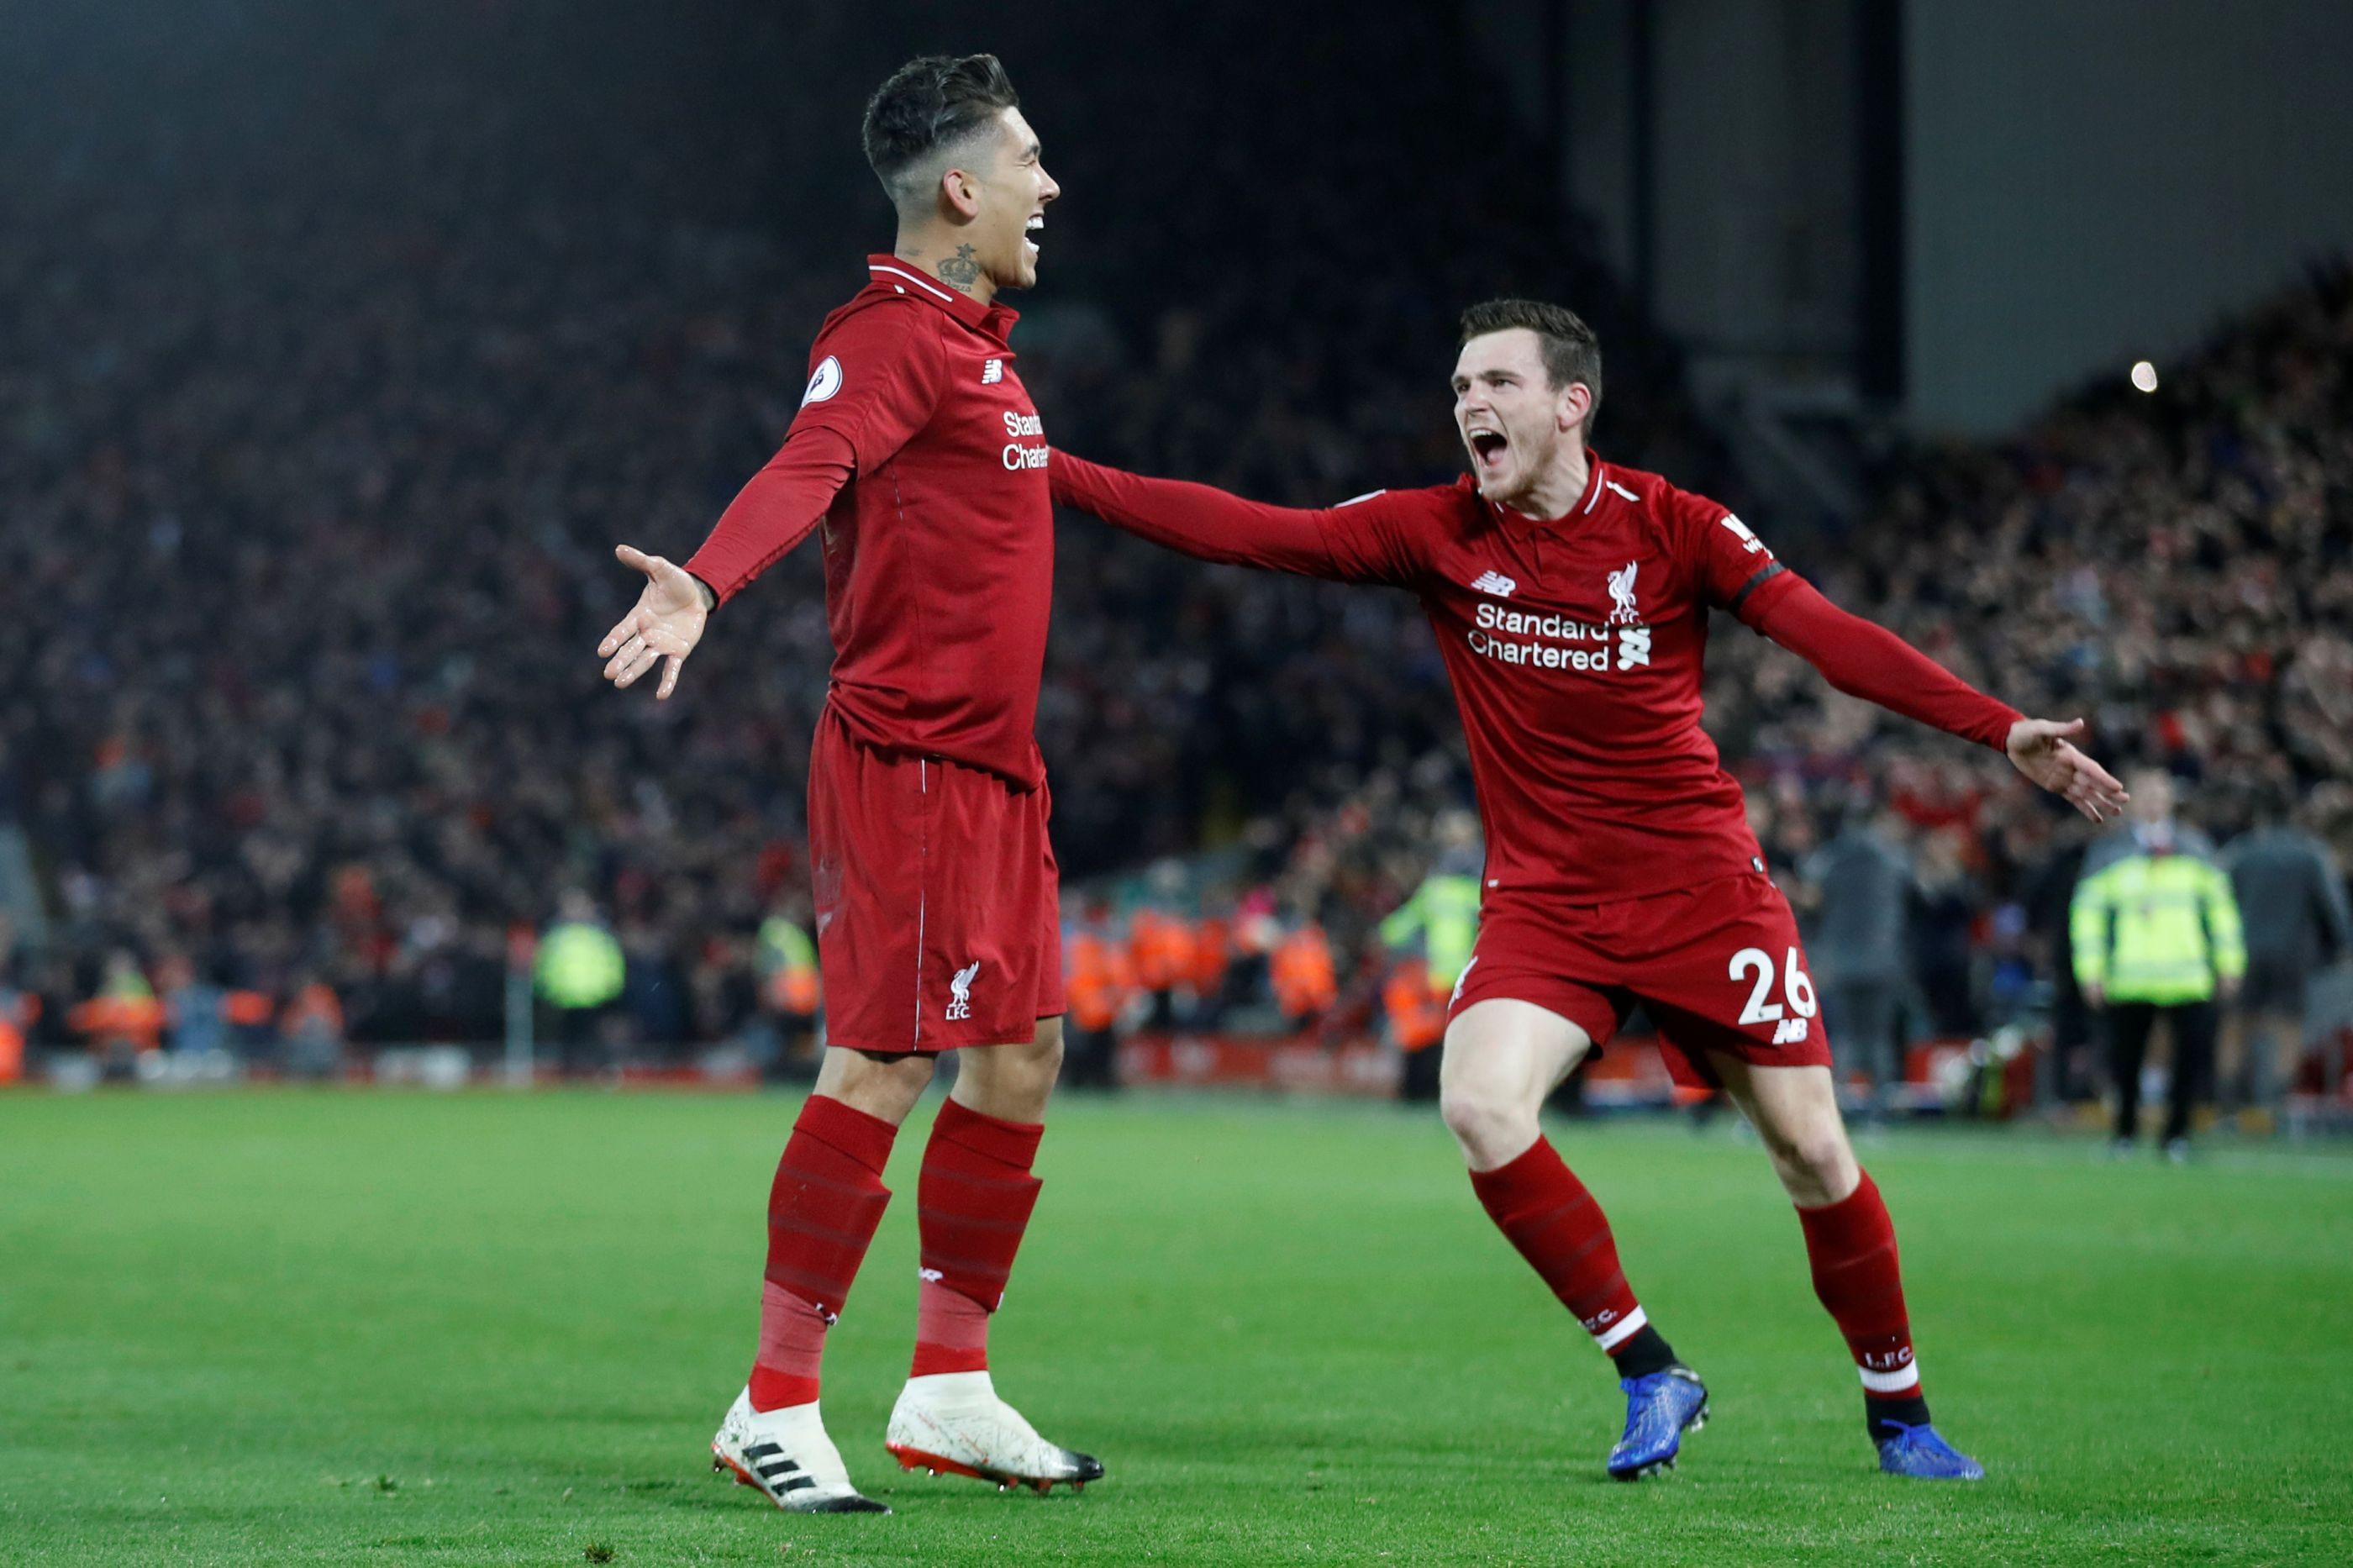 Temos líder! Liverpool recupera de desvantagem e acaba a golear Arsenal